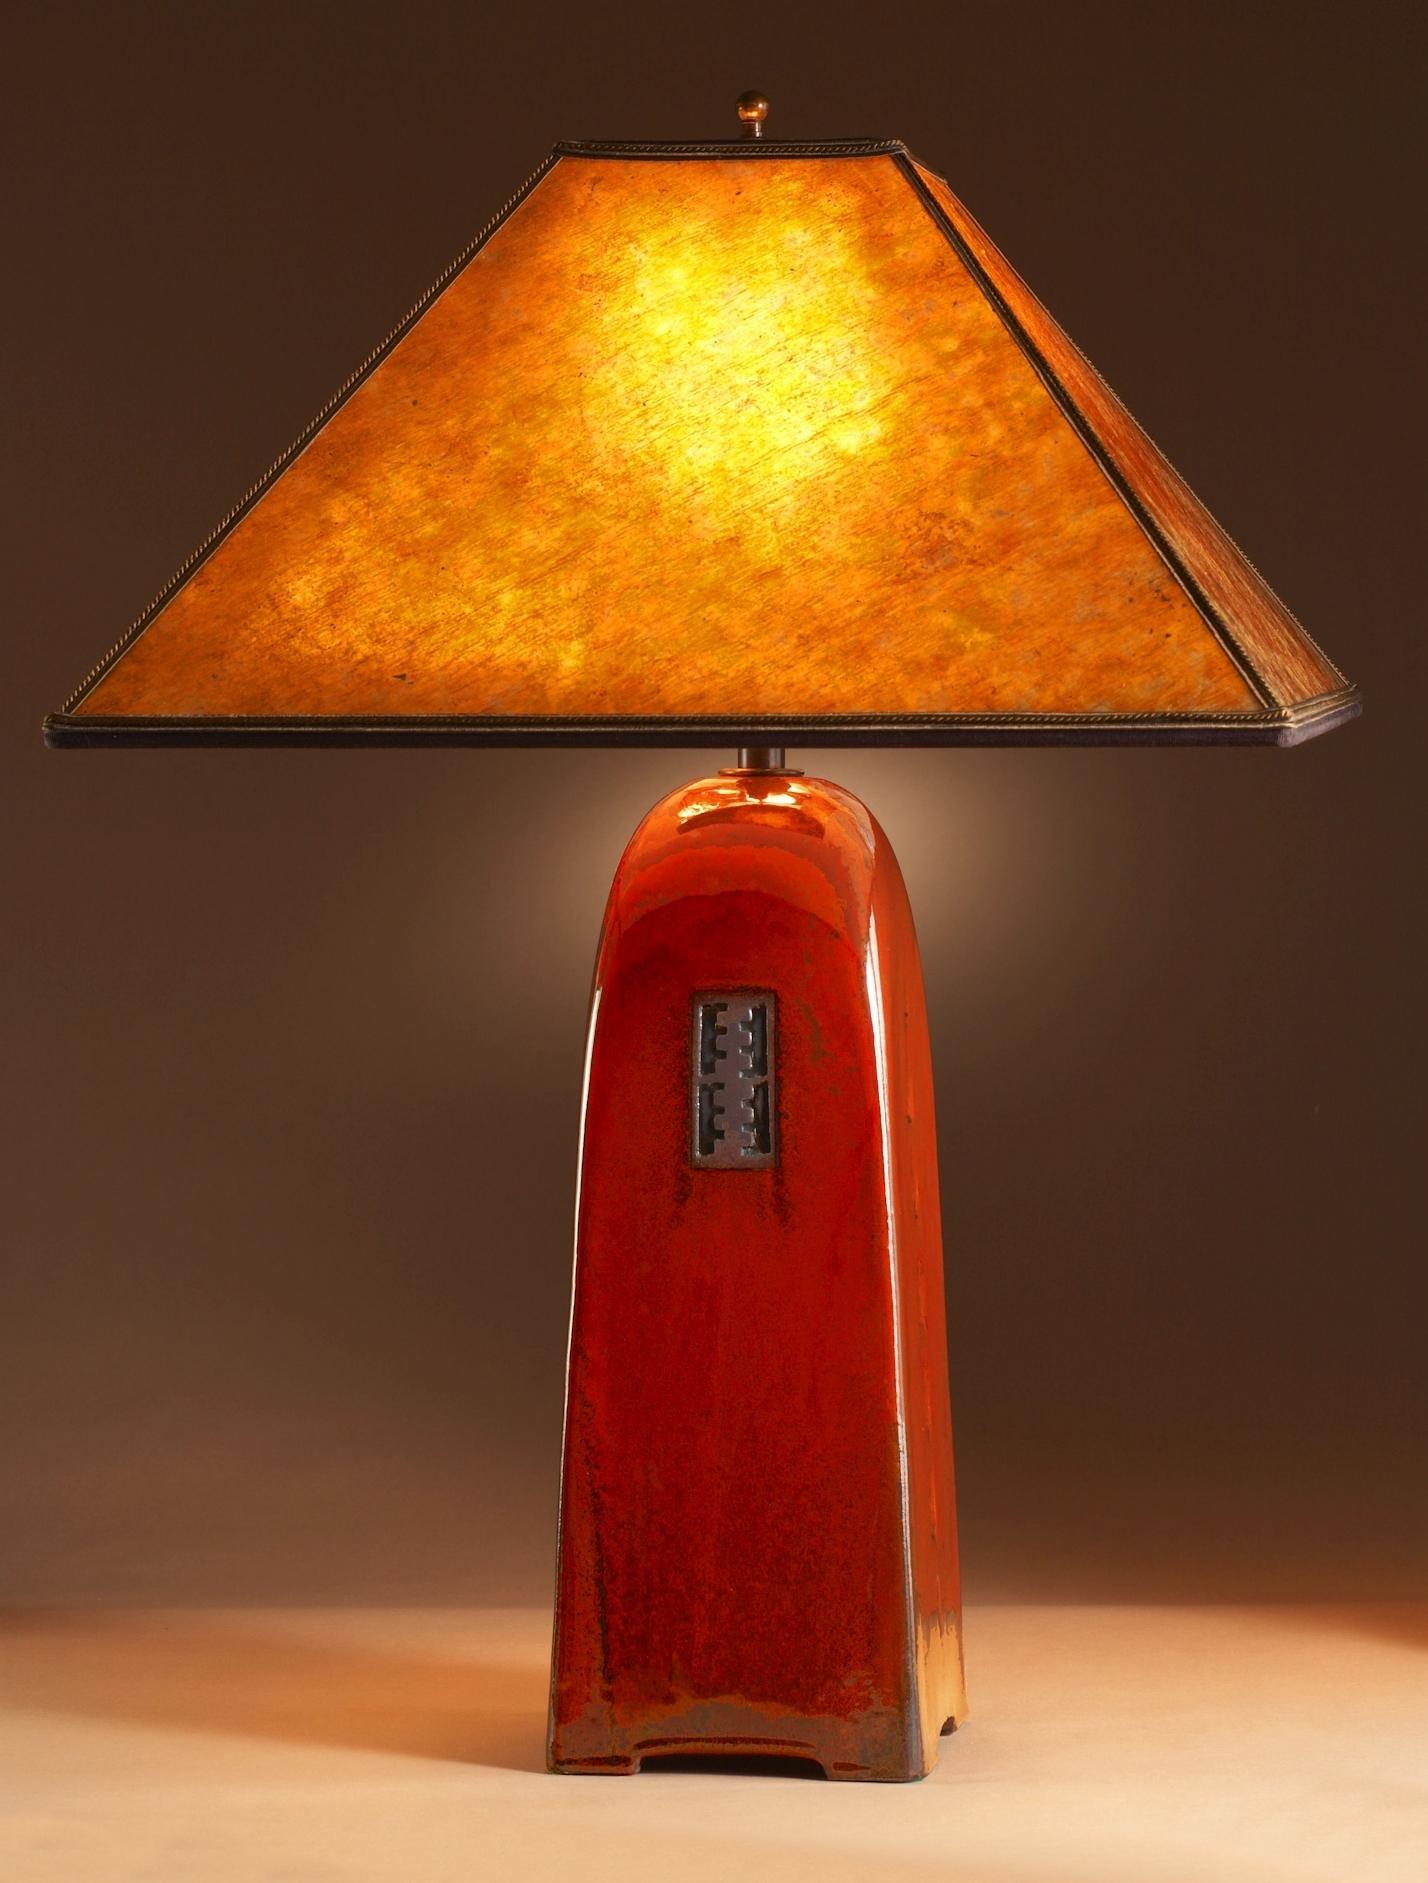 Ceramic Wall Lamp Shades : Russet Lamp with Mica Shade by Jim Webb (Ceramic Lamp) Artful Home